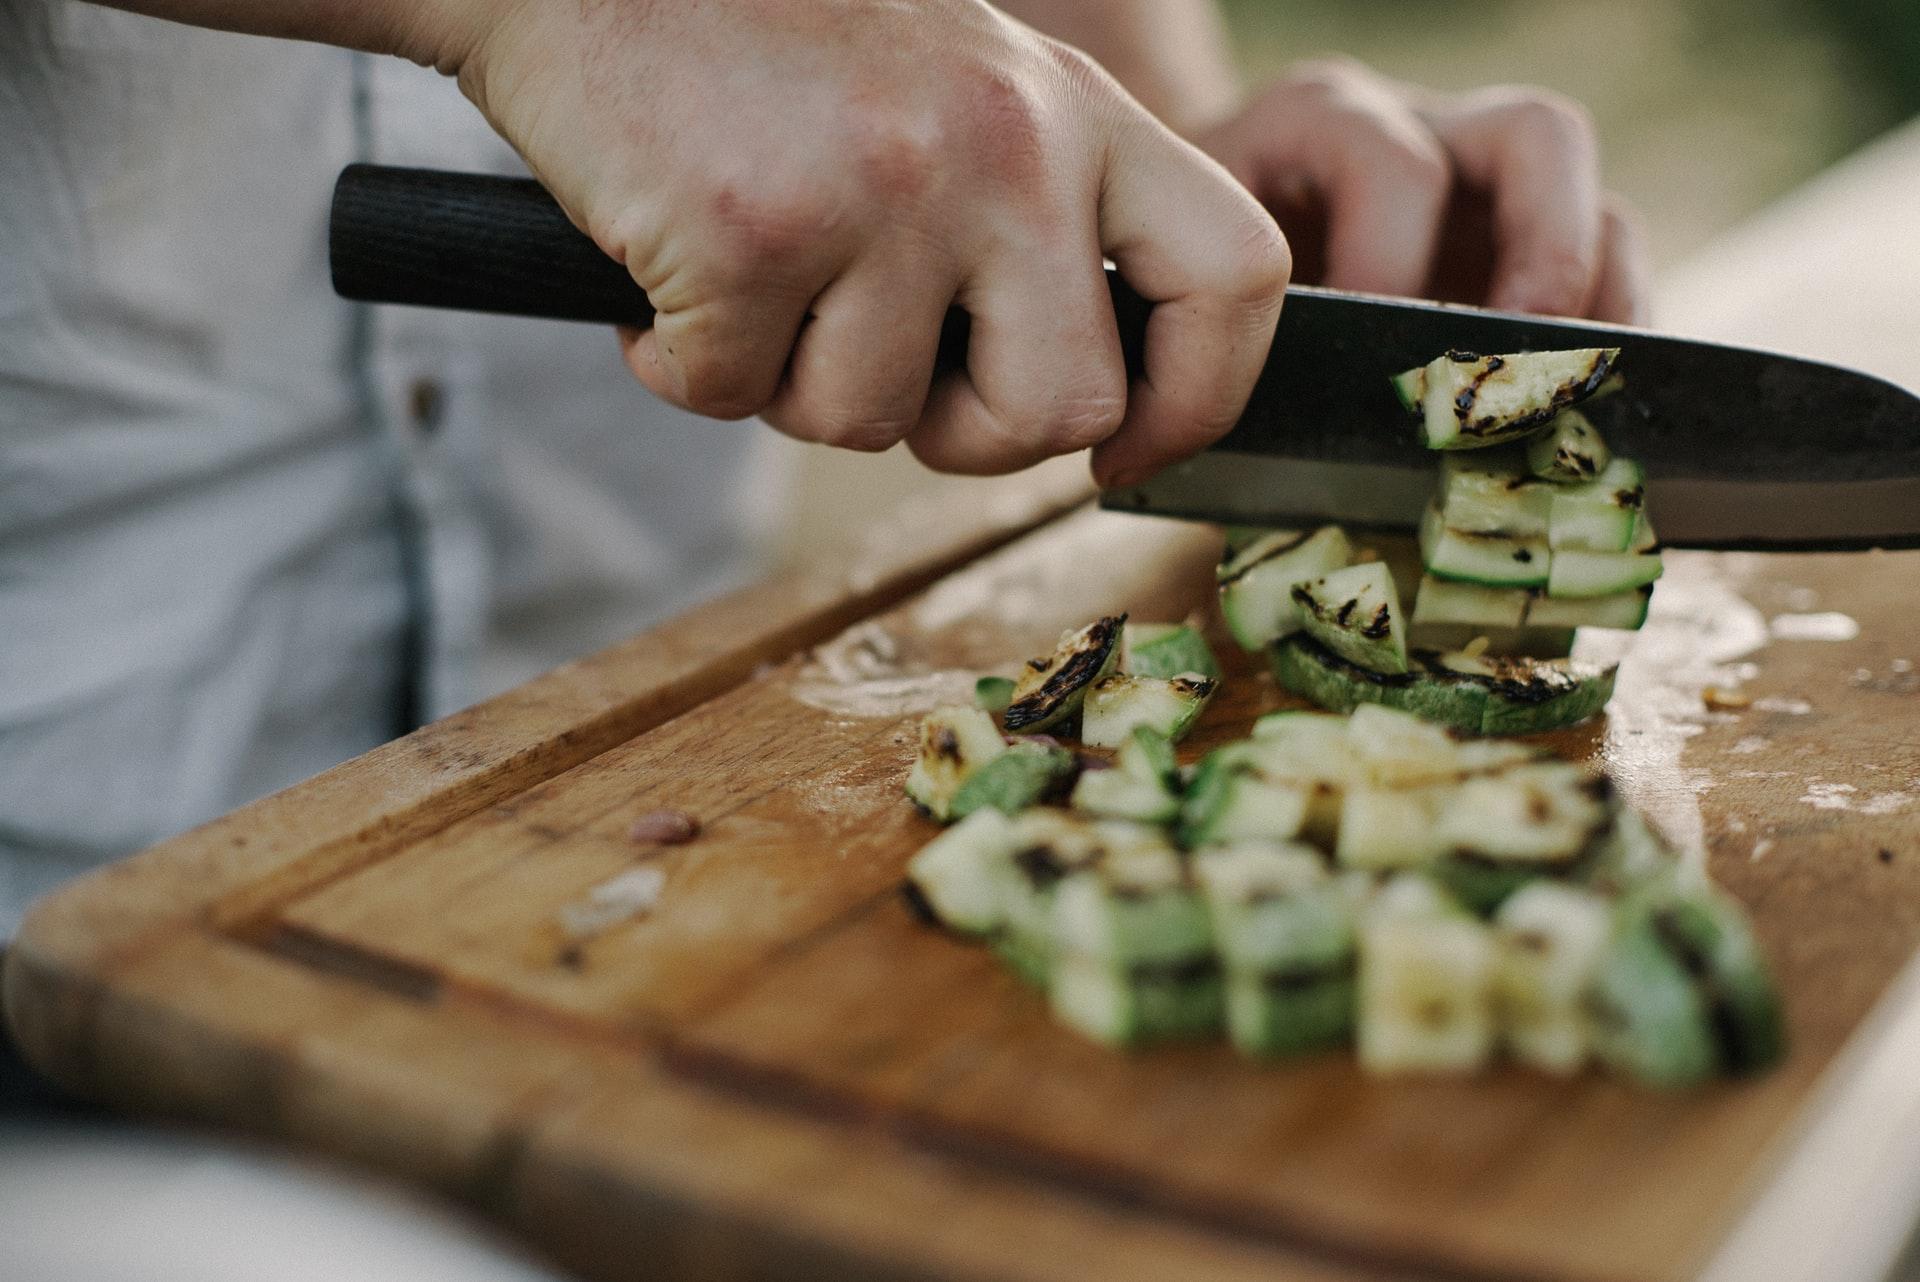 Un homme en train de cuisiner